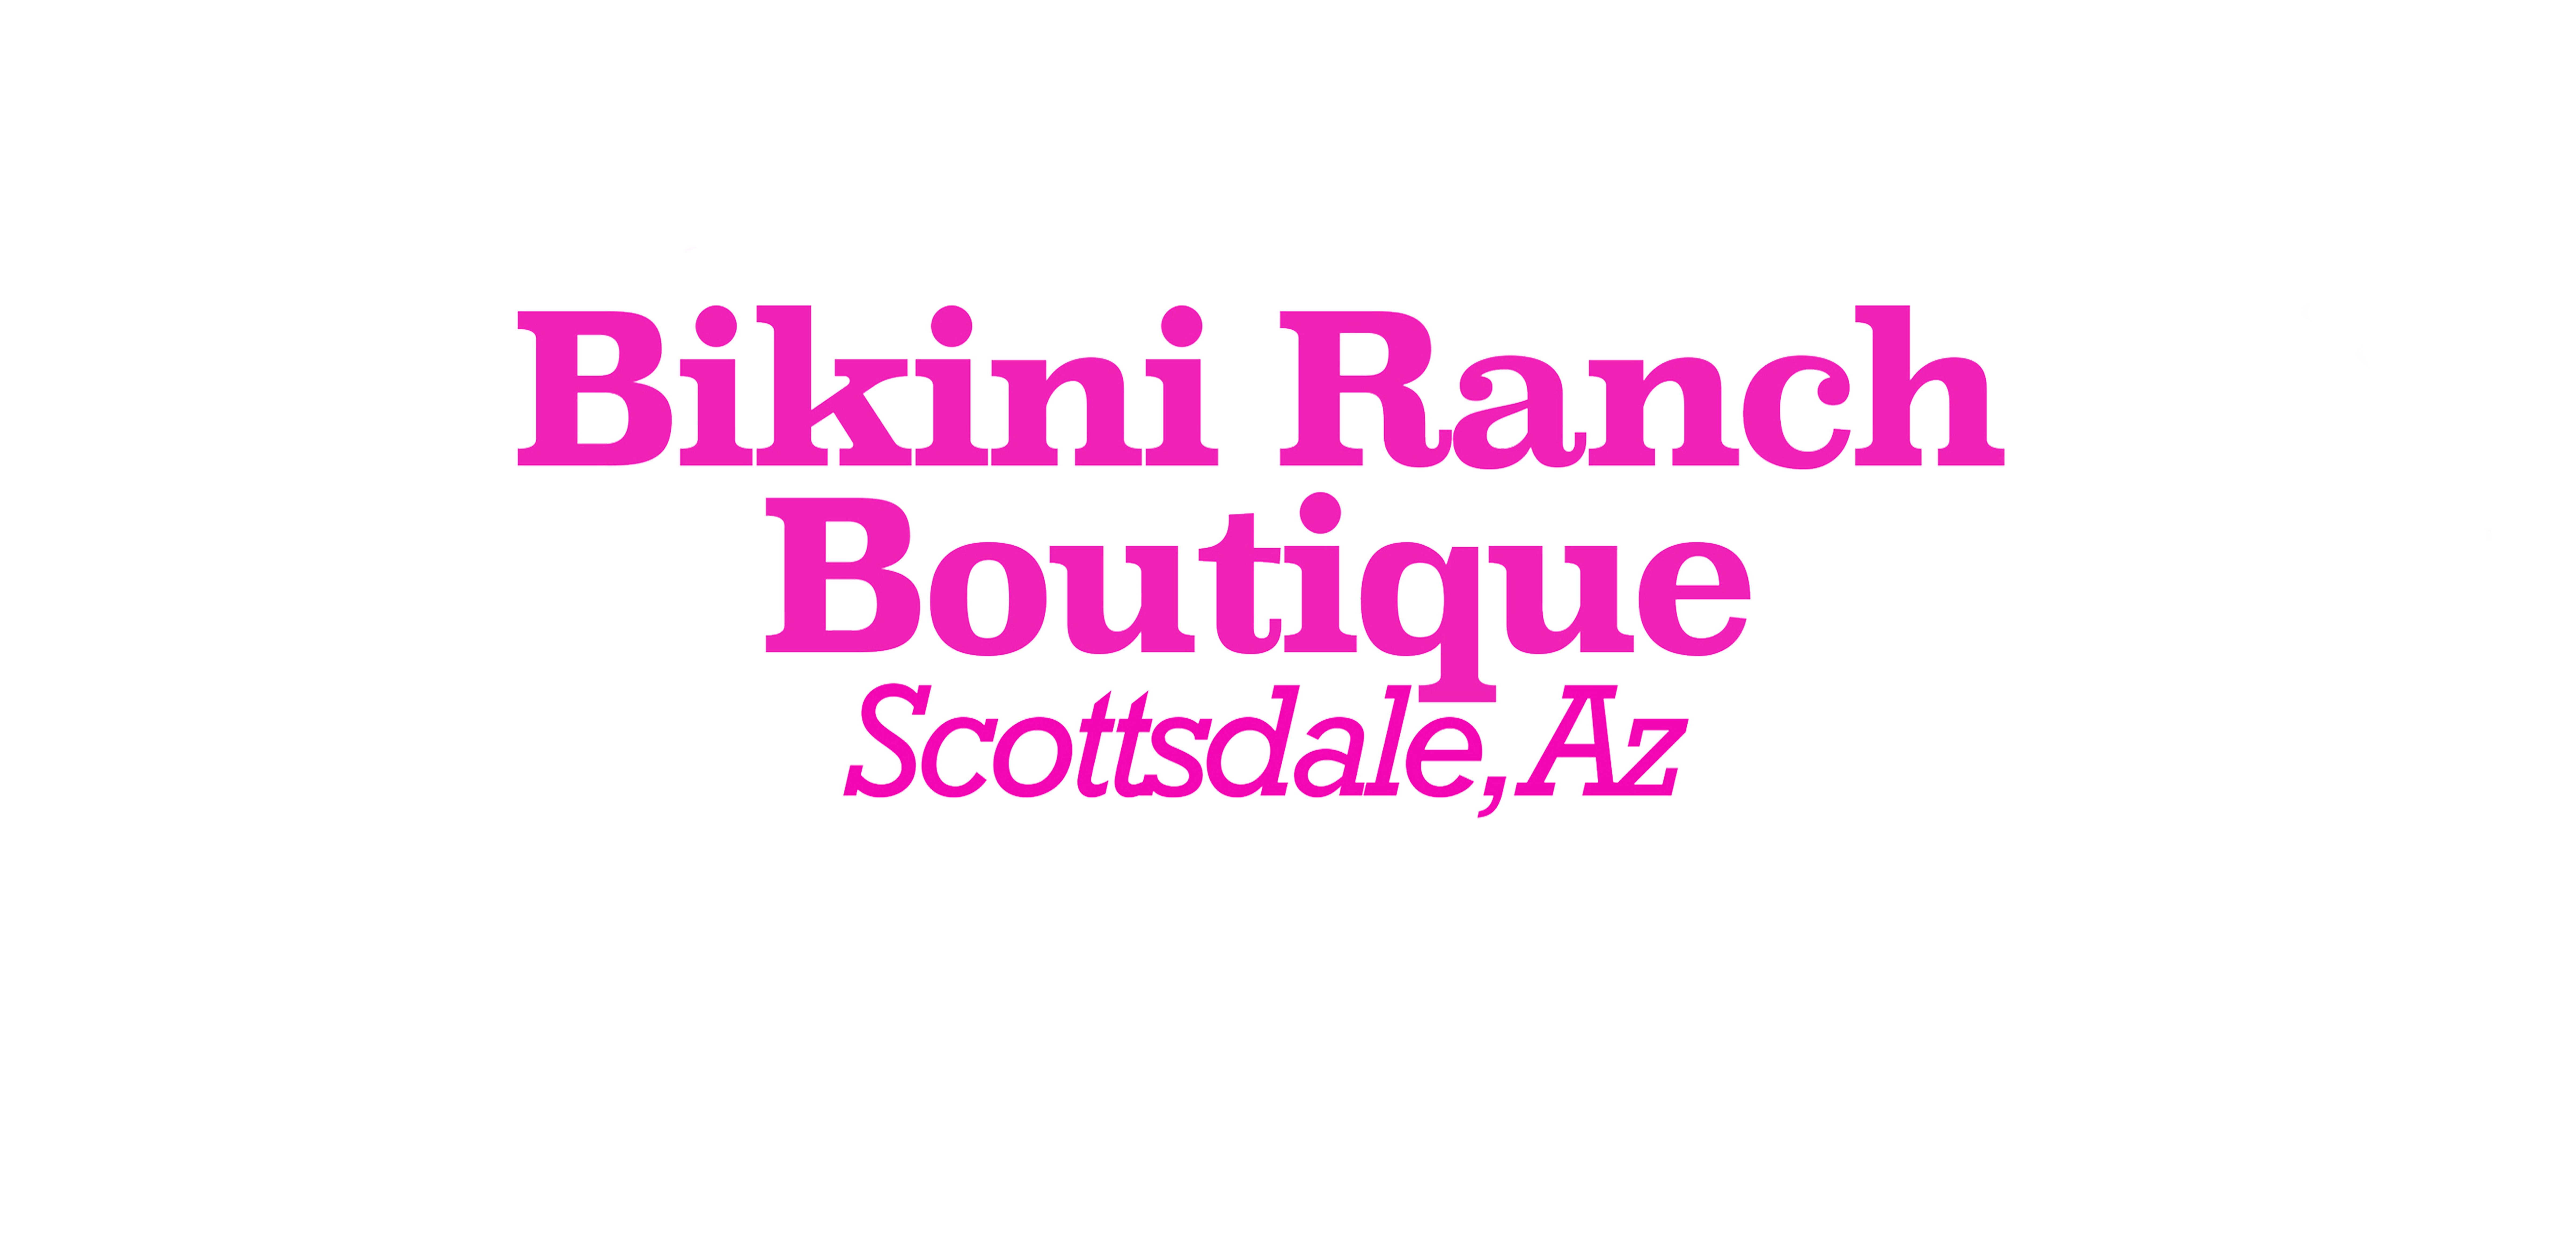 https://www.bikiniranchboutique.com